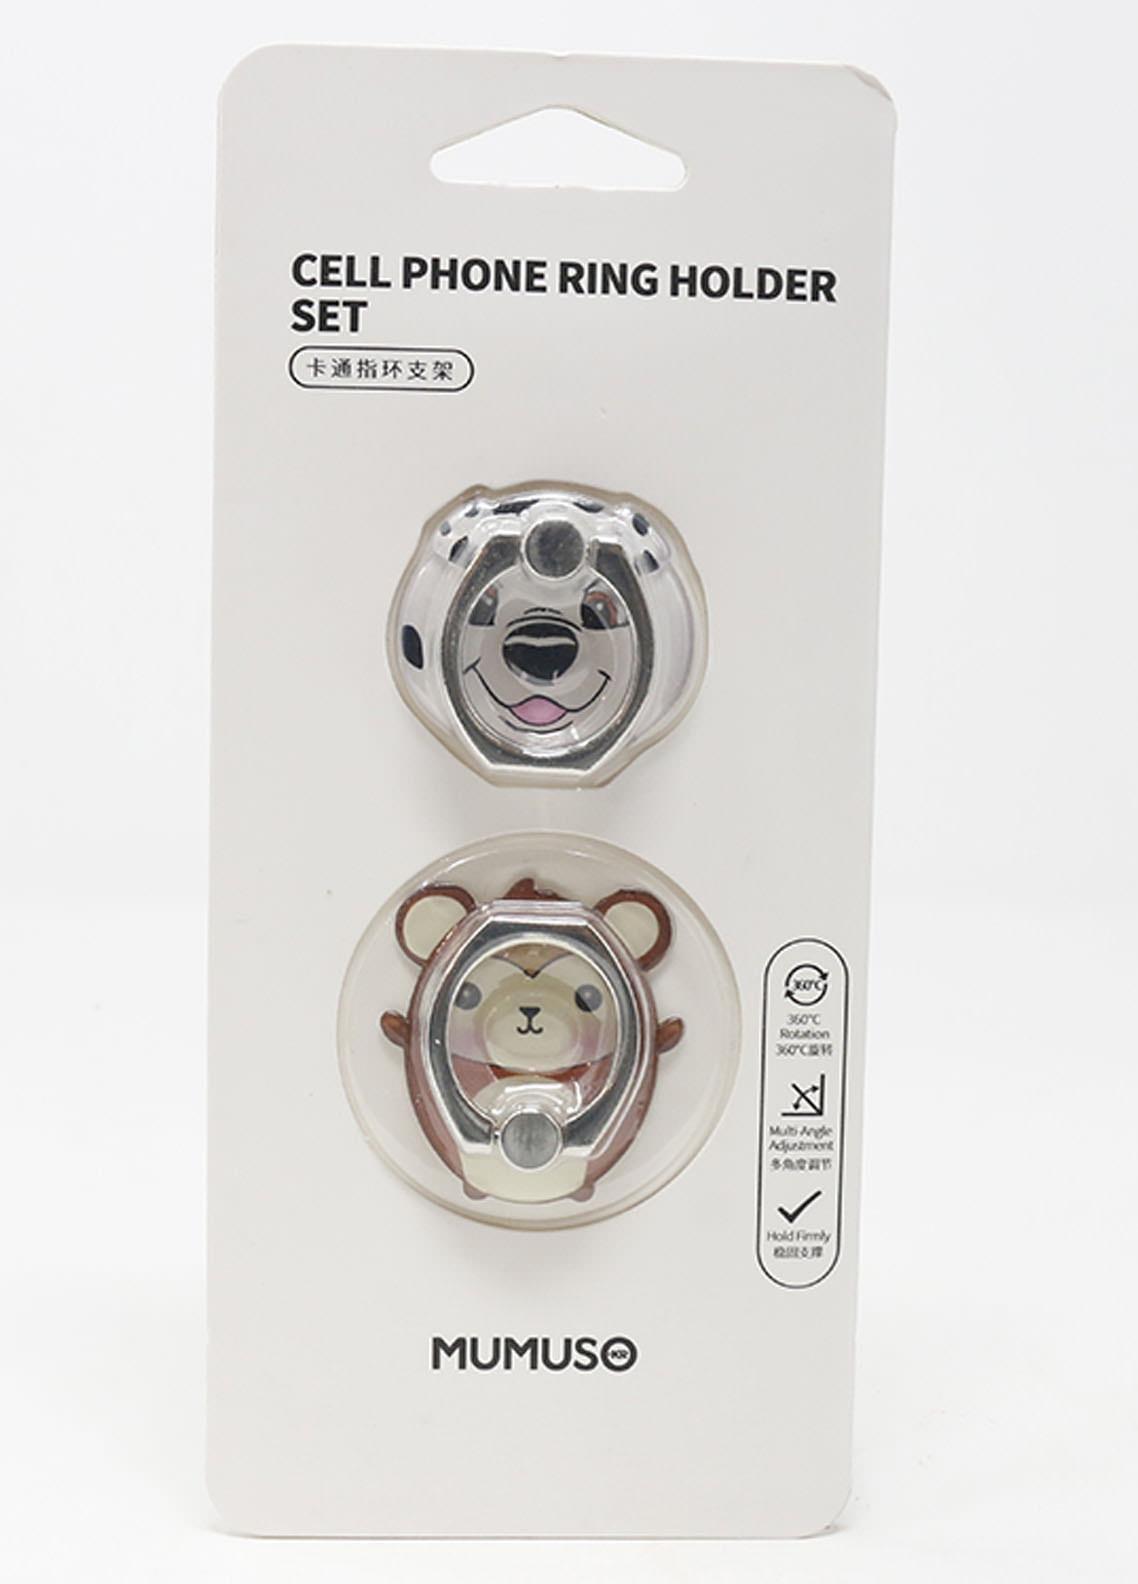 Mumuso Cell Phone Ring Holder Set (Animal)